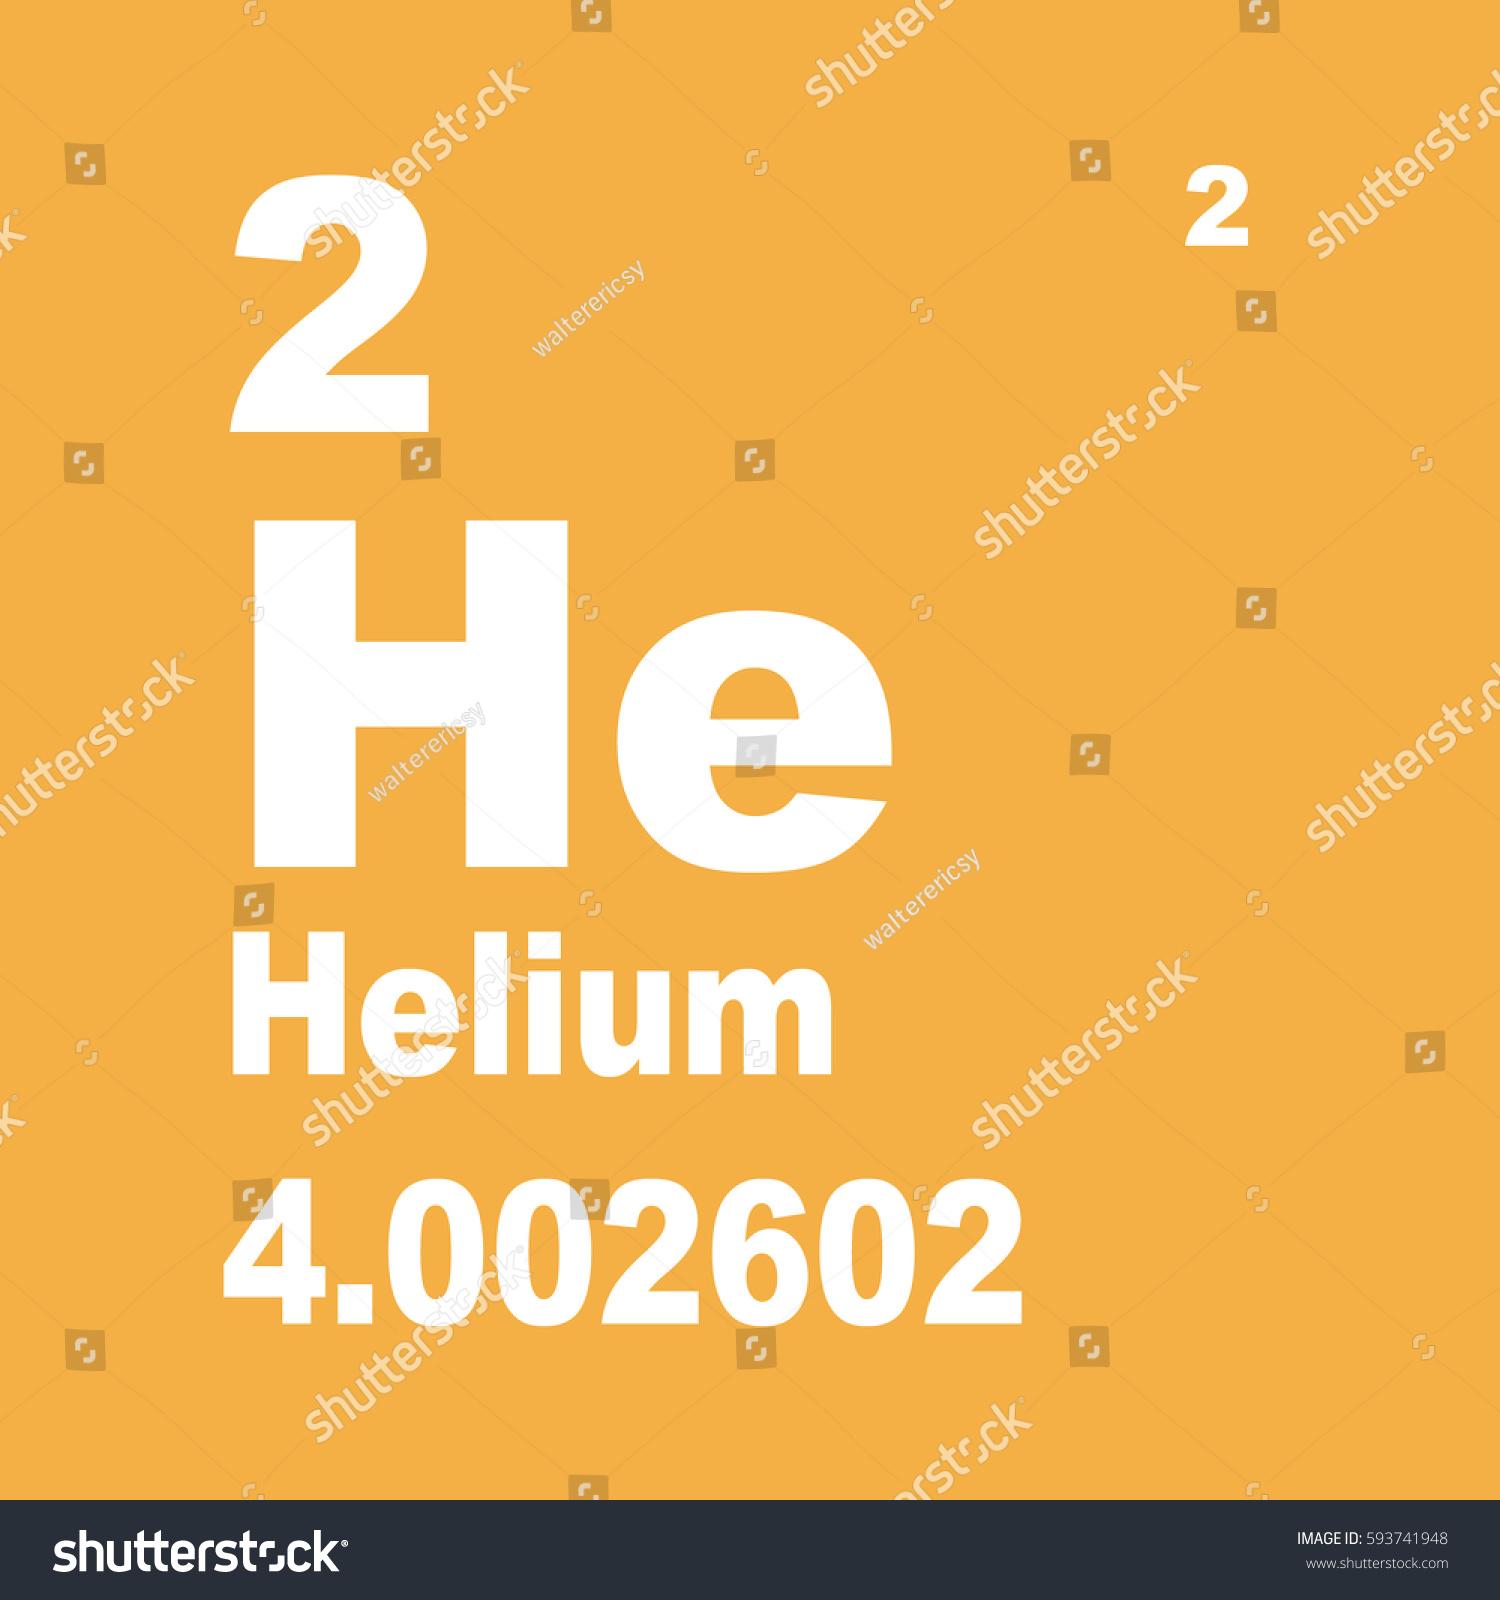 Helium symbol periodic table choice image periodic table images periodic table for helium choice image periodic table images helium periodic table elements stock illustration 593741948 gamestrikefo Gallery